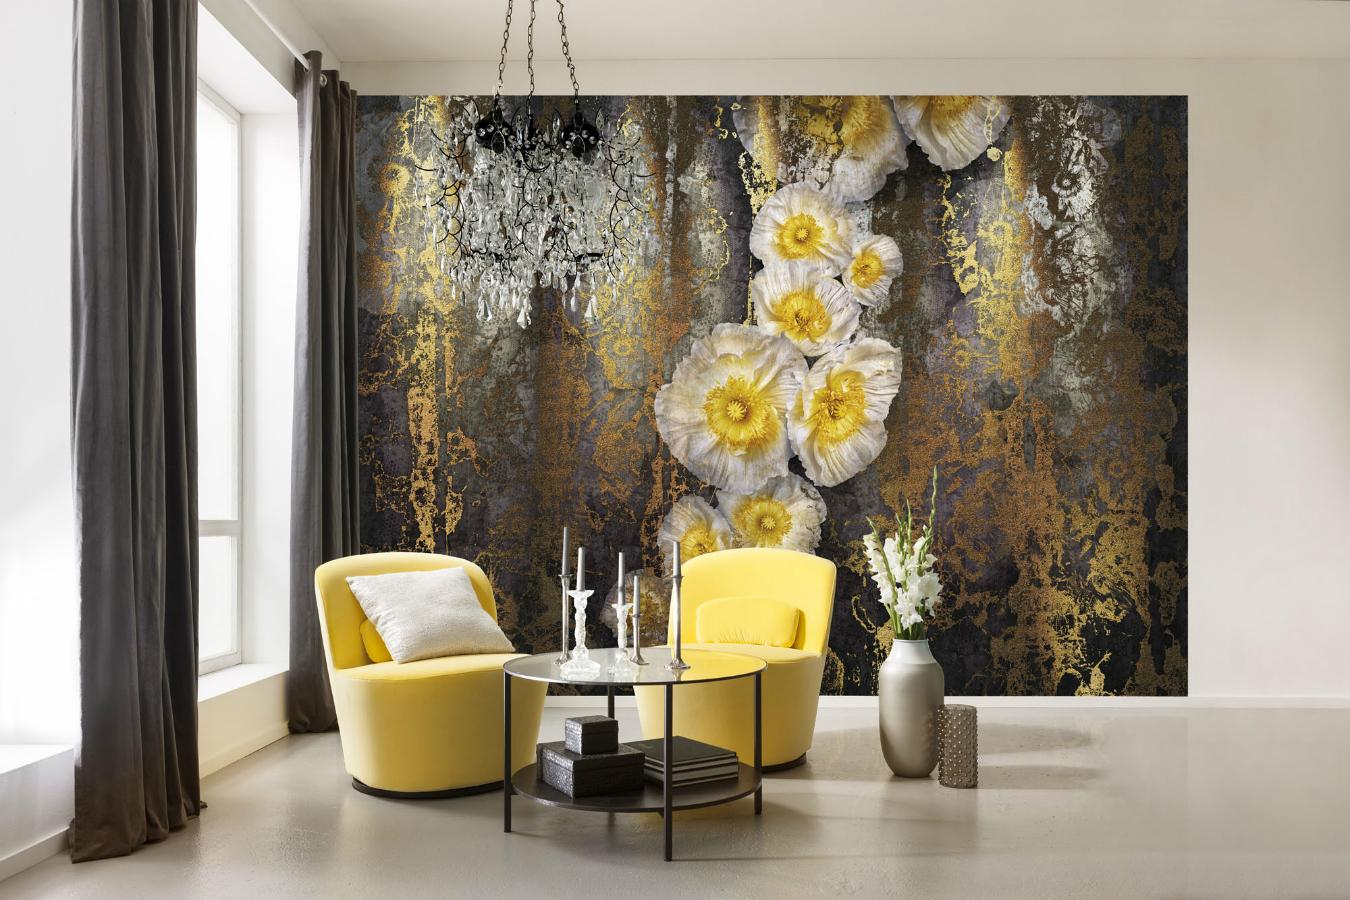 Design Photomural Serafina – Supreme Yellow